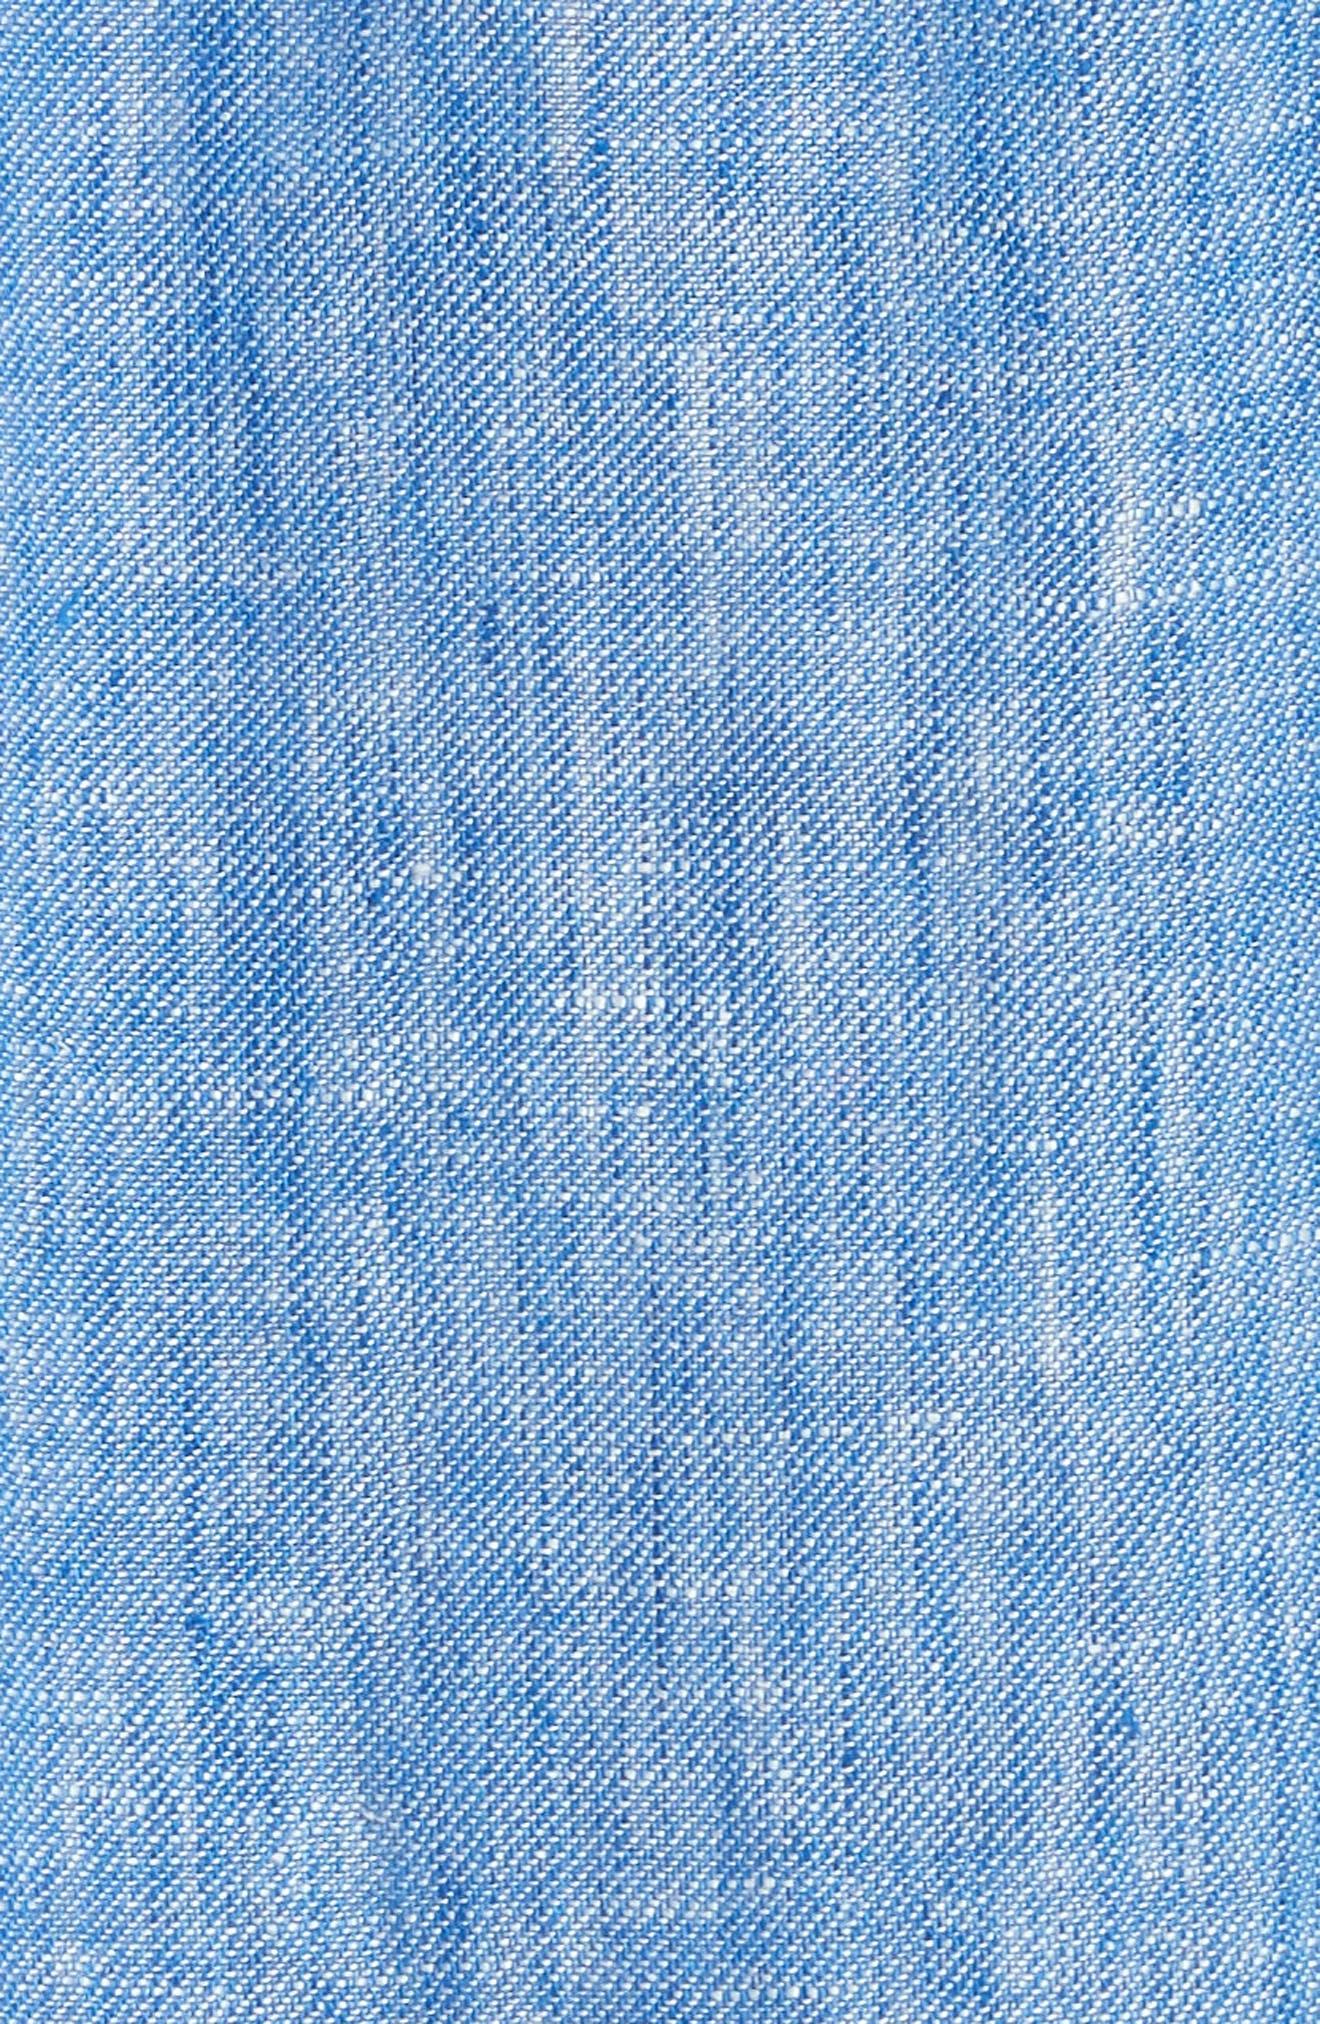 Fermina Ruffle Sleeve Linen Dress,                             Alternate thumbnail 5, color,